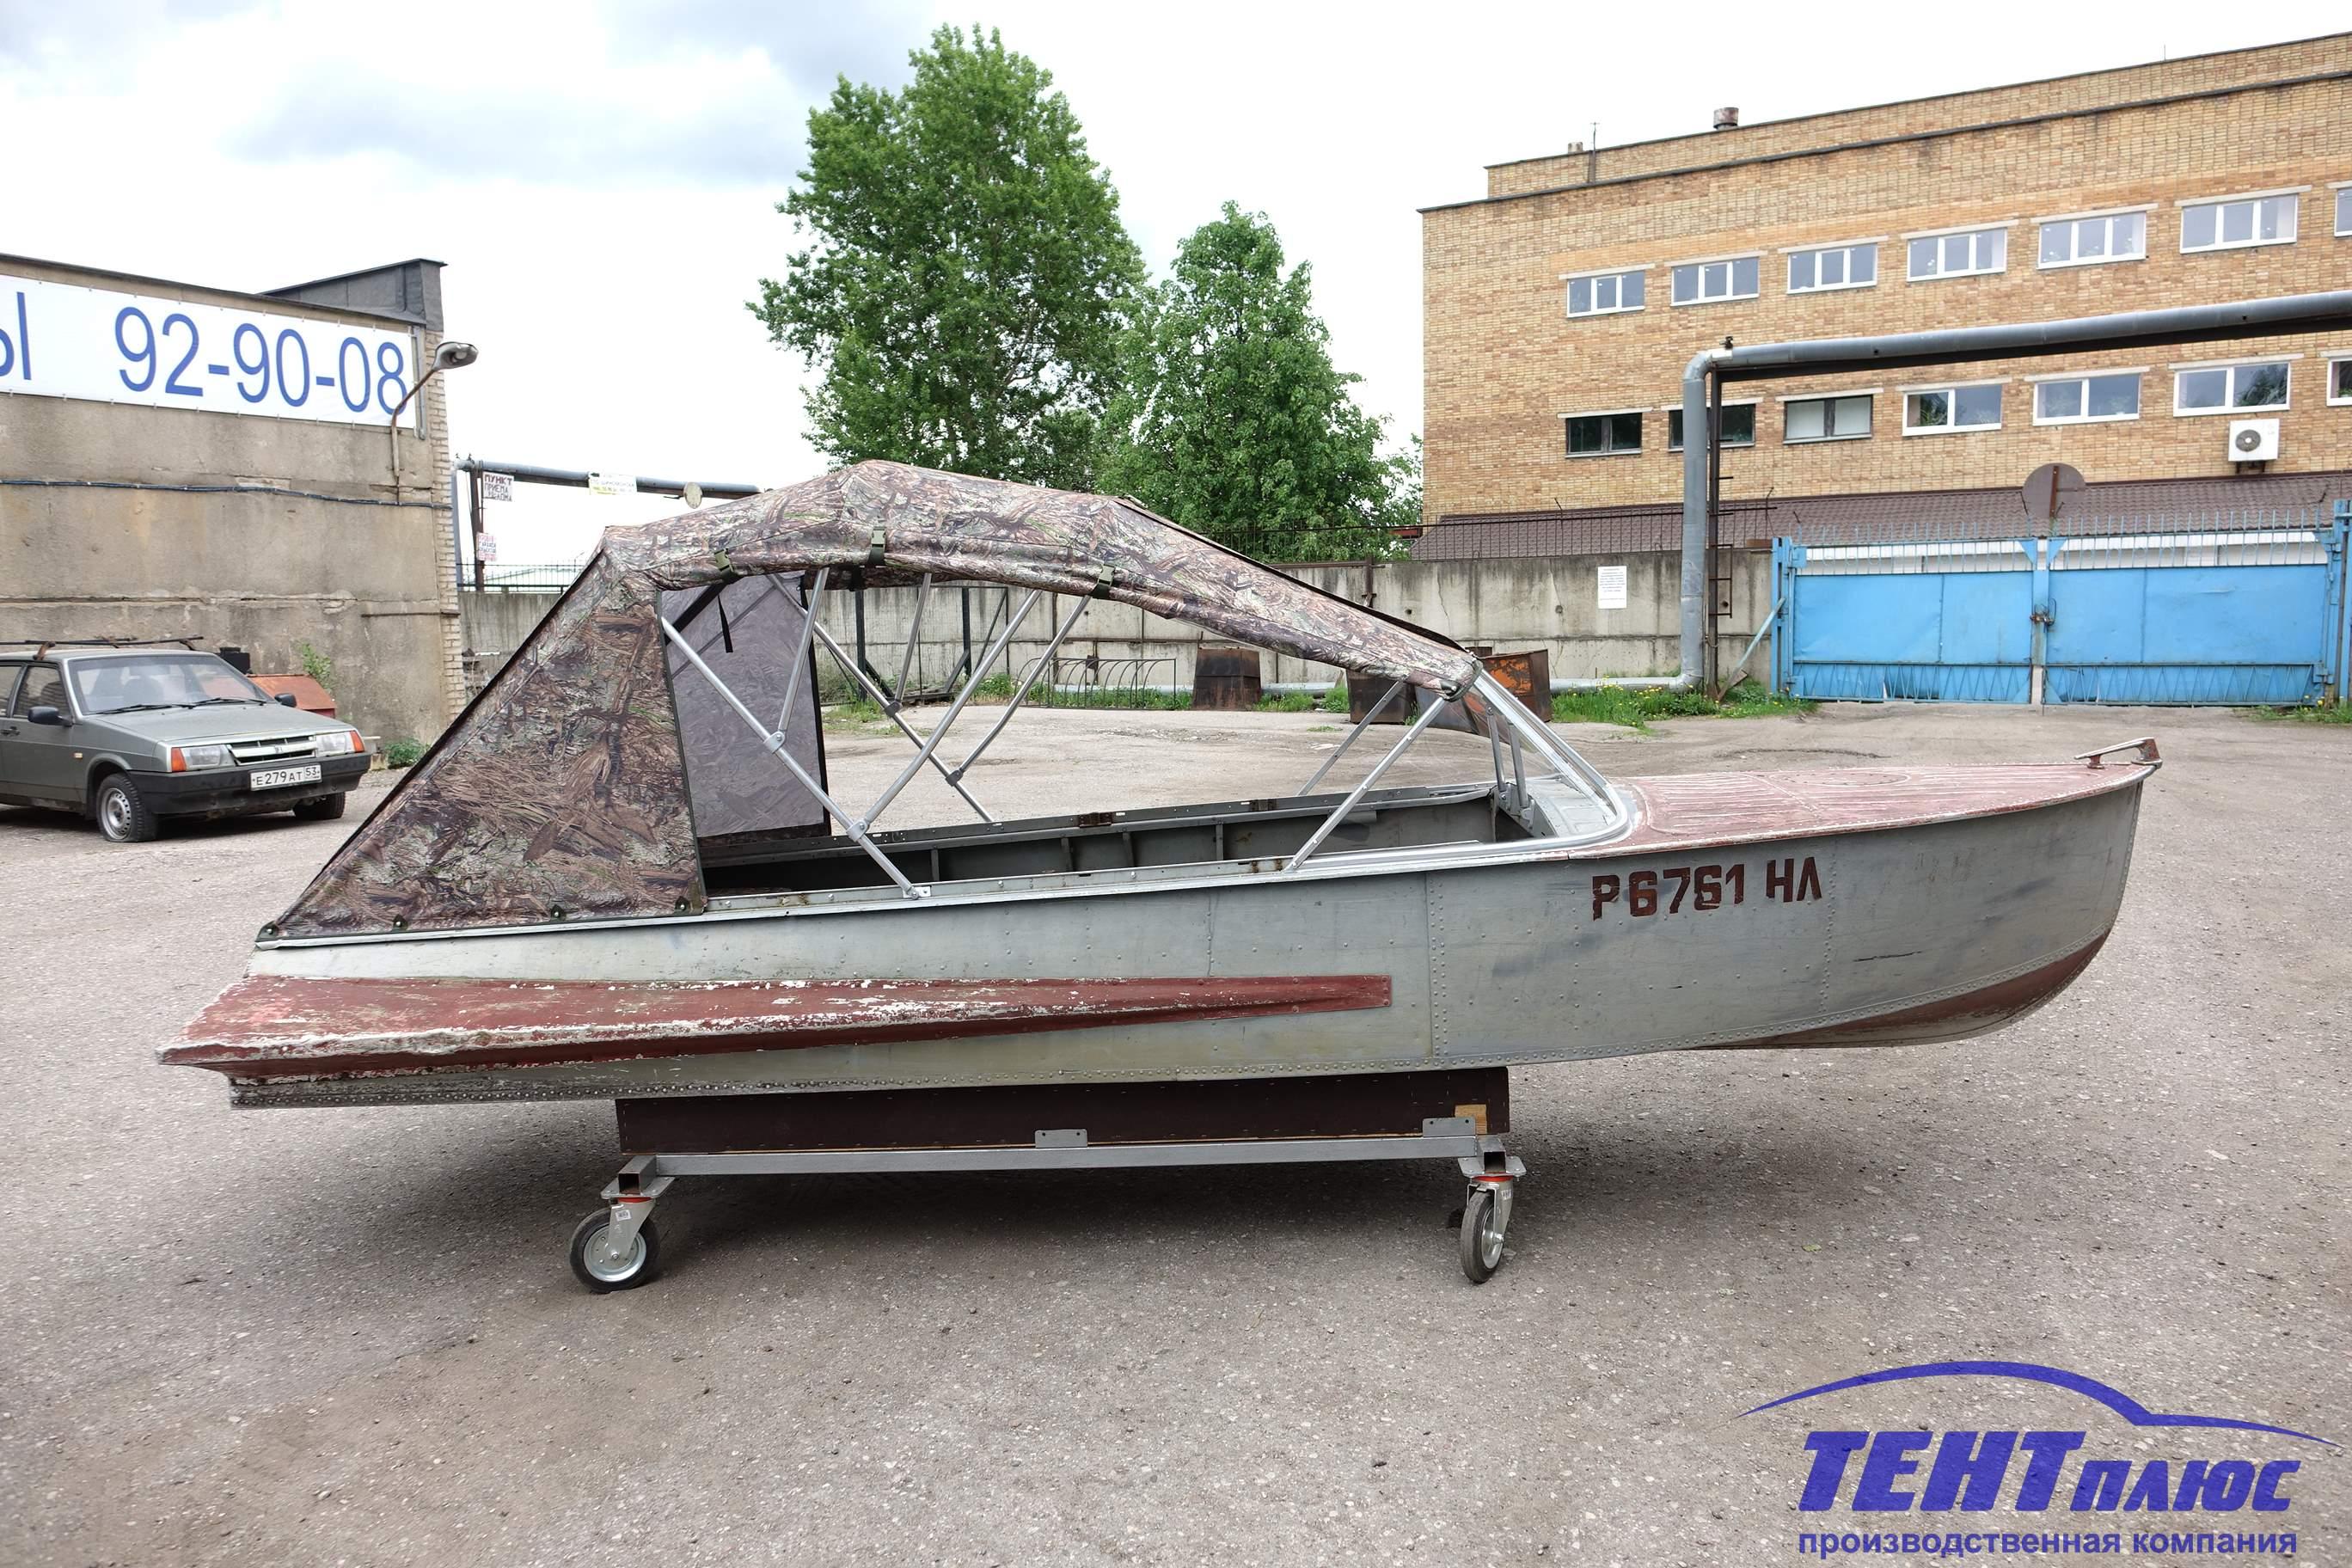 название советской моторной лодки, 7 букв, 7 буква «А», сканворд